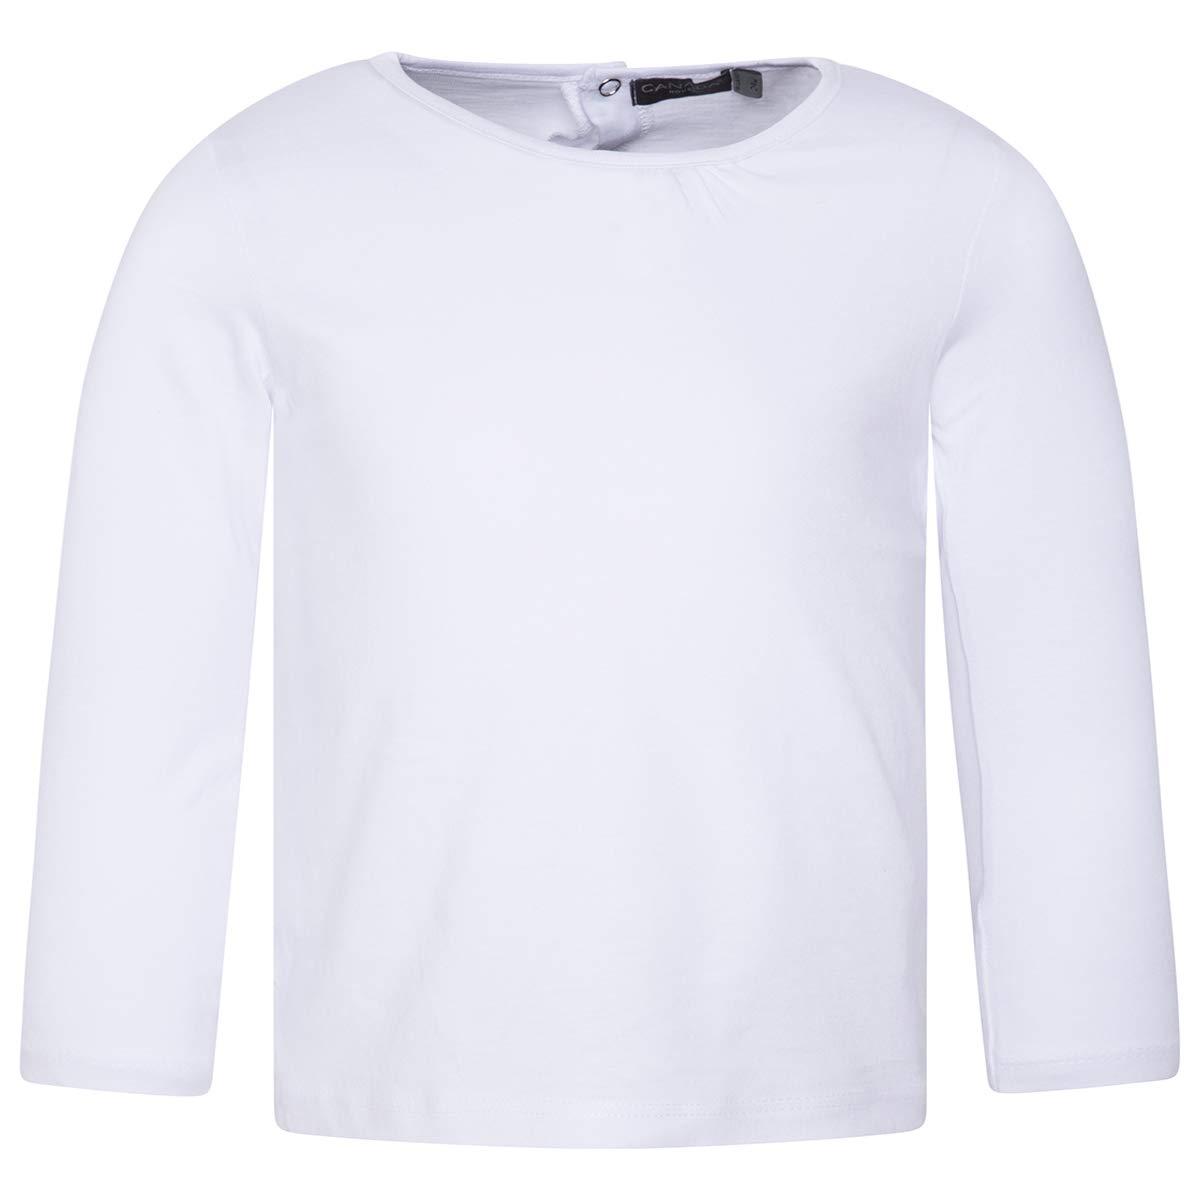 Canada House Camiseta bbplain beb/é ni/ño Blanca